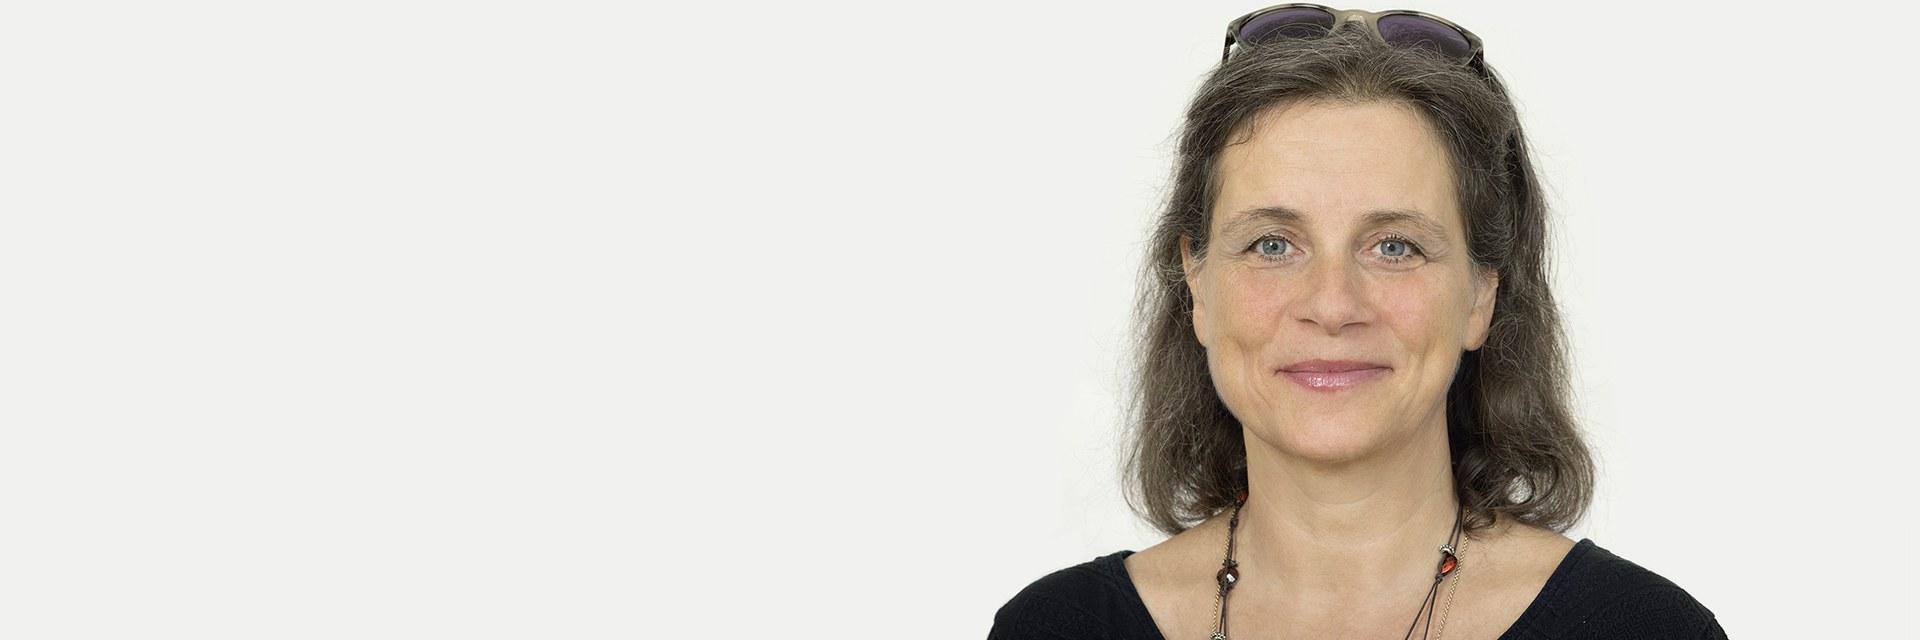 Prof. Astrid Bosshard